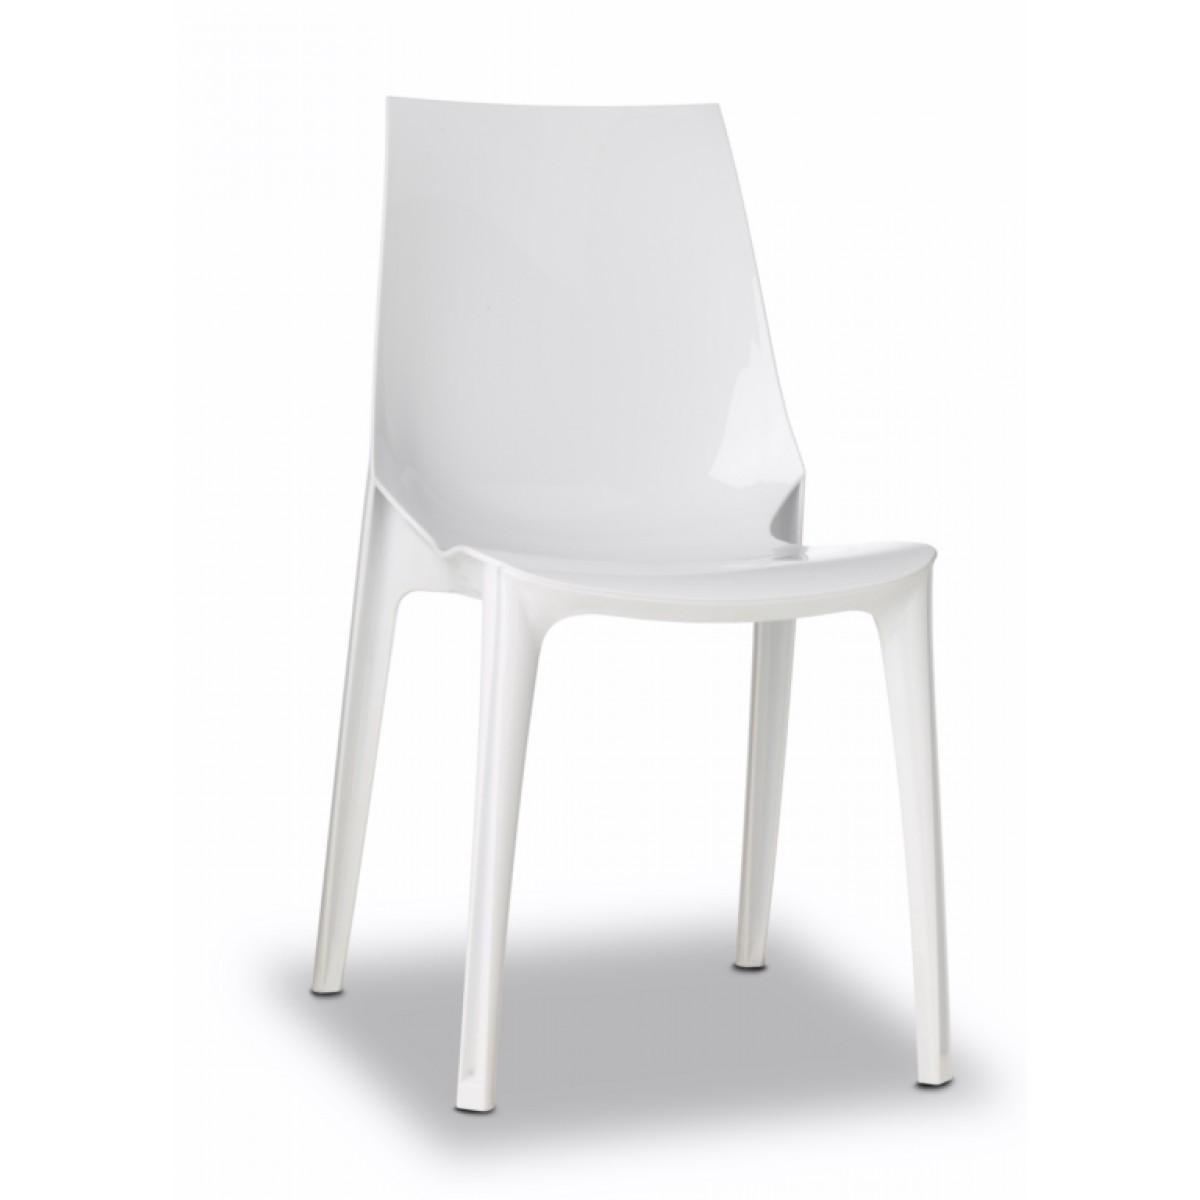 stuhl wei kunststoff m belideen. Black Bedroom Furniture Sets. Home Design Ideas